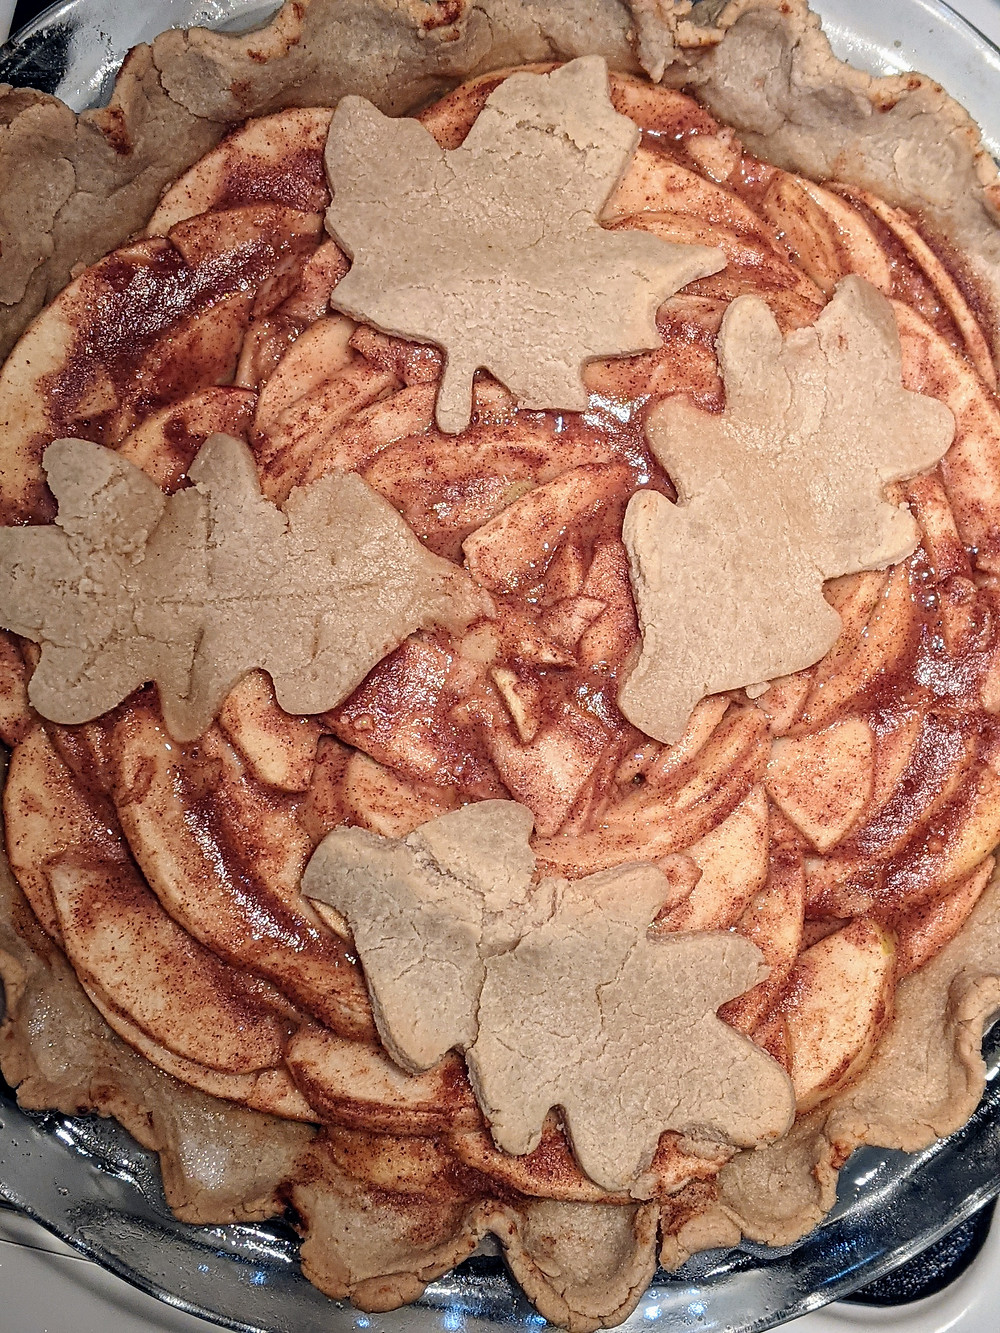 Paleo apple pie - Food Allergy-Friendly Thanksgiving - Amanda MacGregor - Food Allergy recipes - centineo